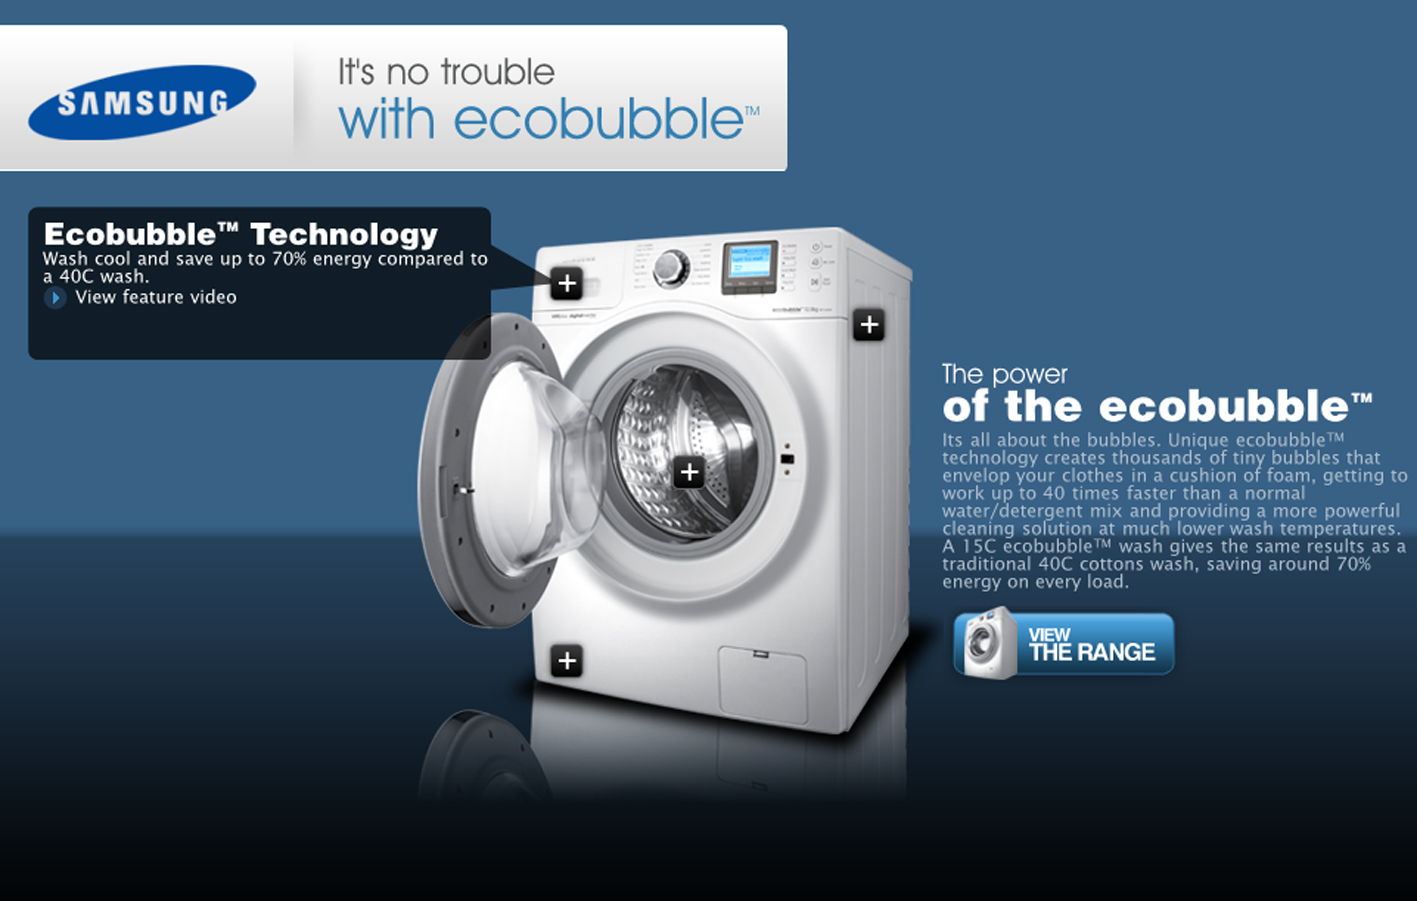 sm appliance washing machine